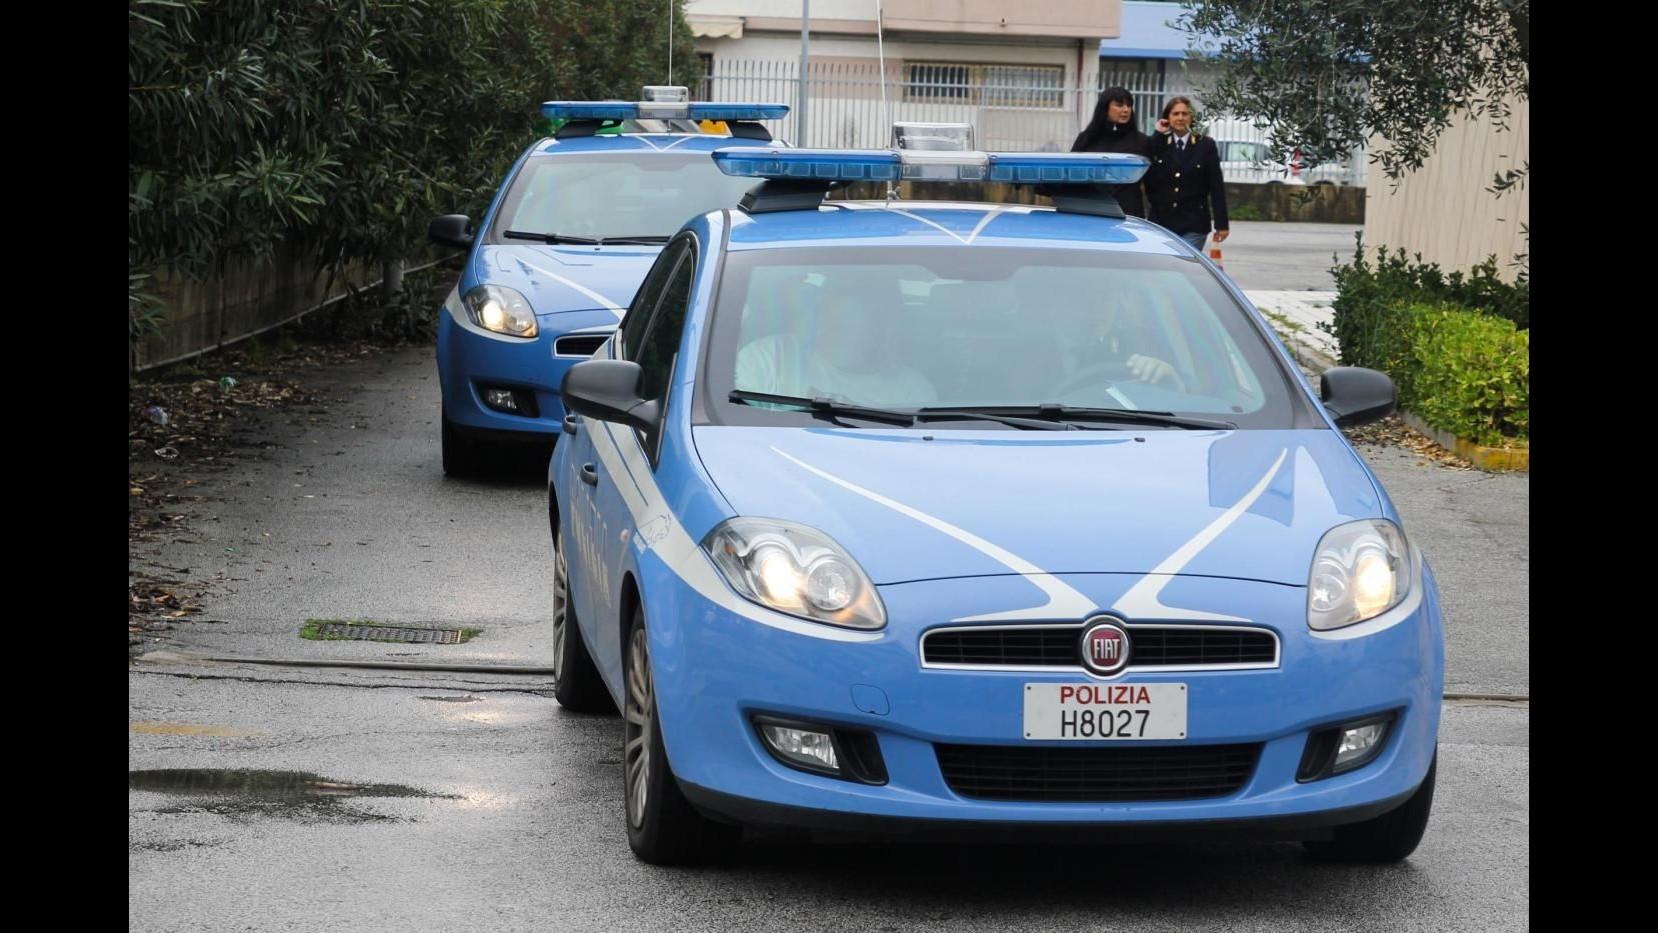 Mafia, arrestato a Castelvetrano Filardo, cugino di Messina Denaro